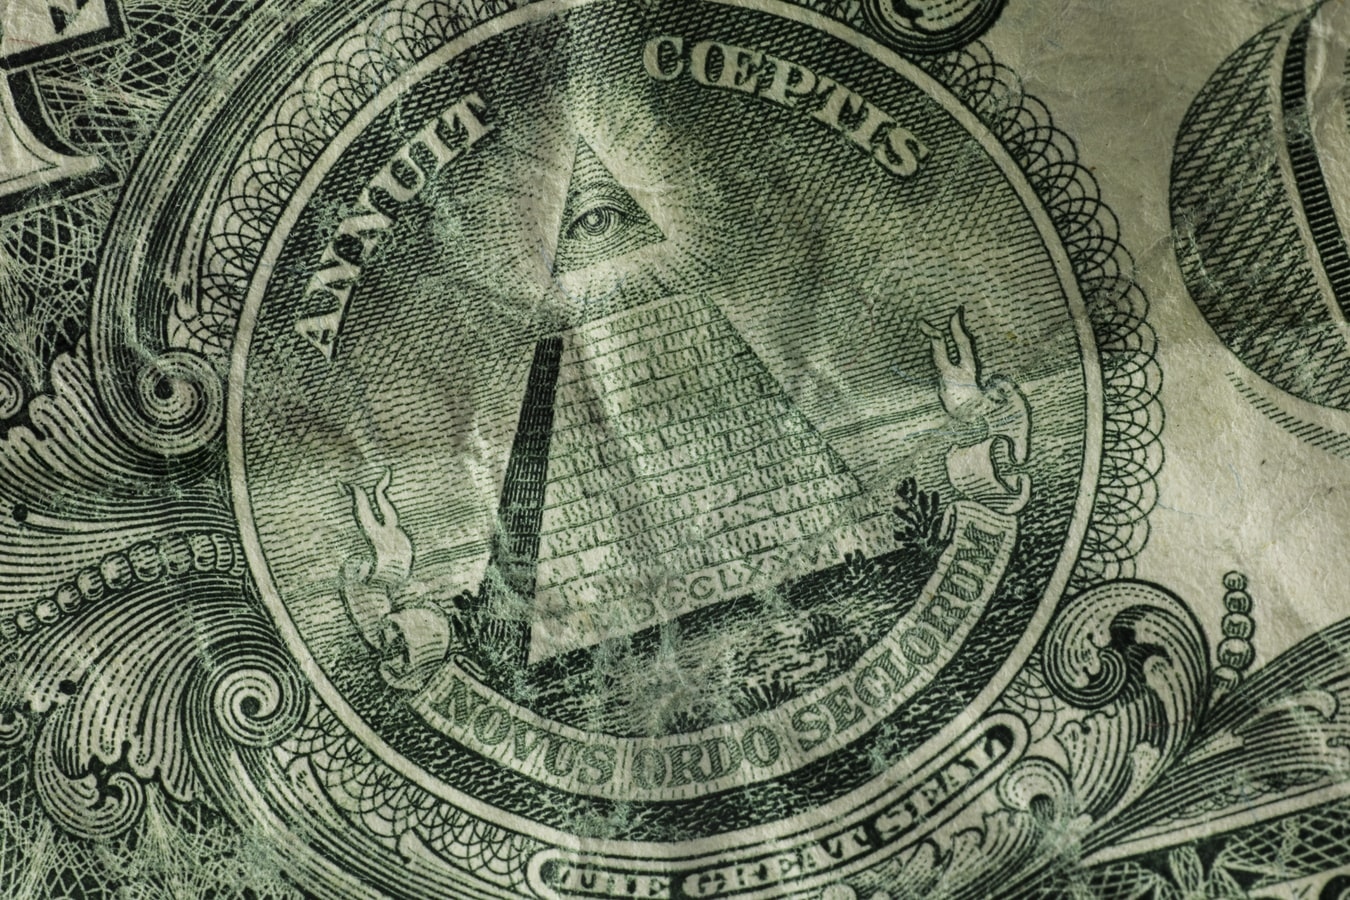 dollar in dispute in uber false advertising lawsuit